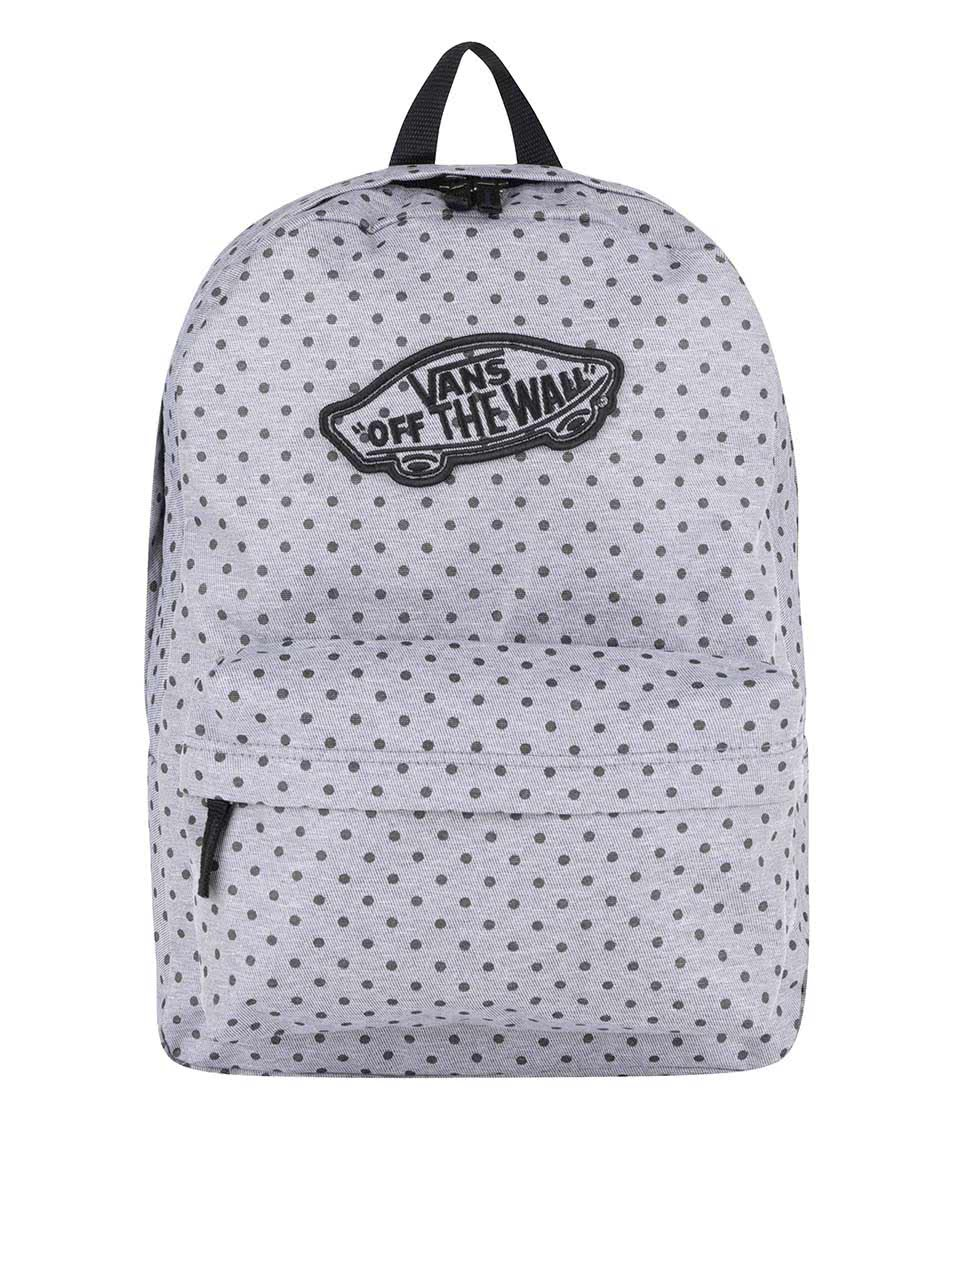 0d9859b62a Sivý dámsky batoh s bodkami Vans Realm ...